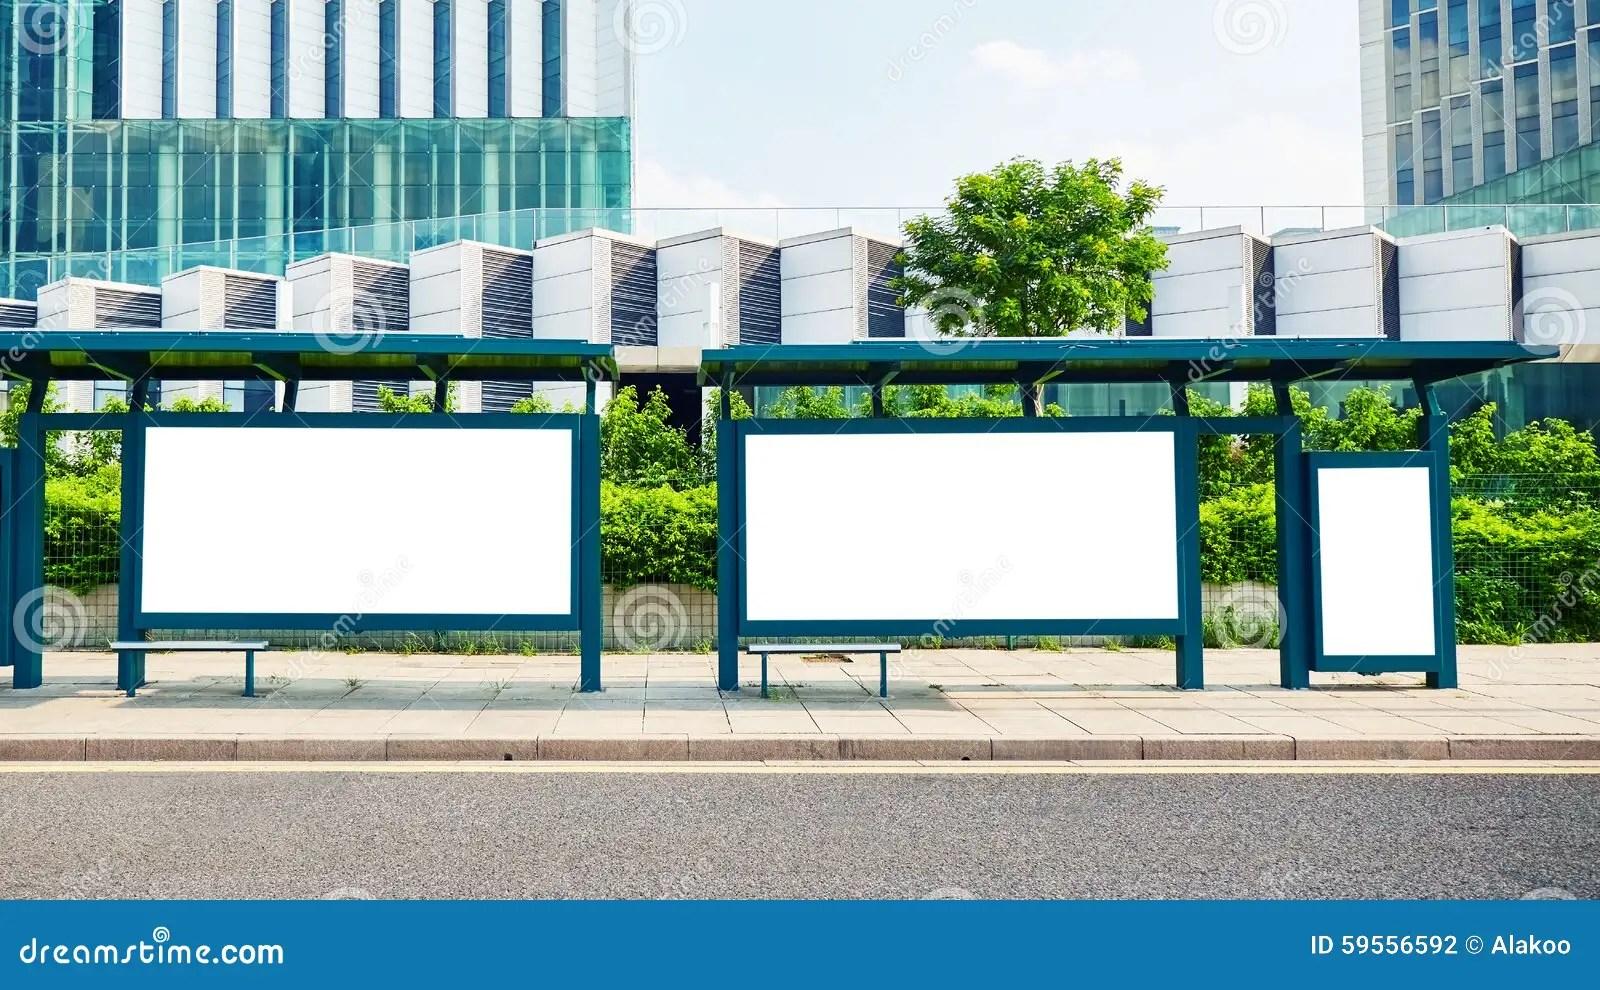 Blank Billboard Advertising